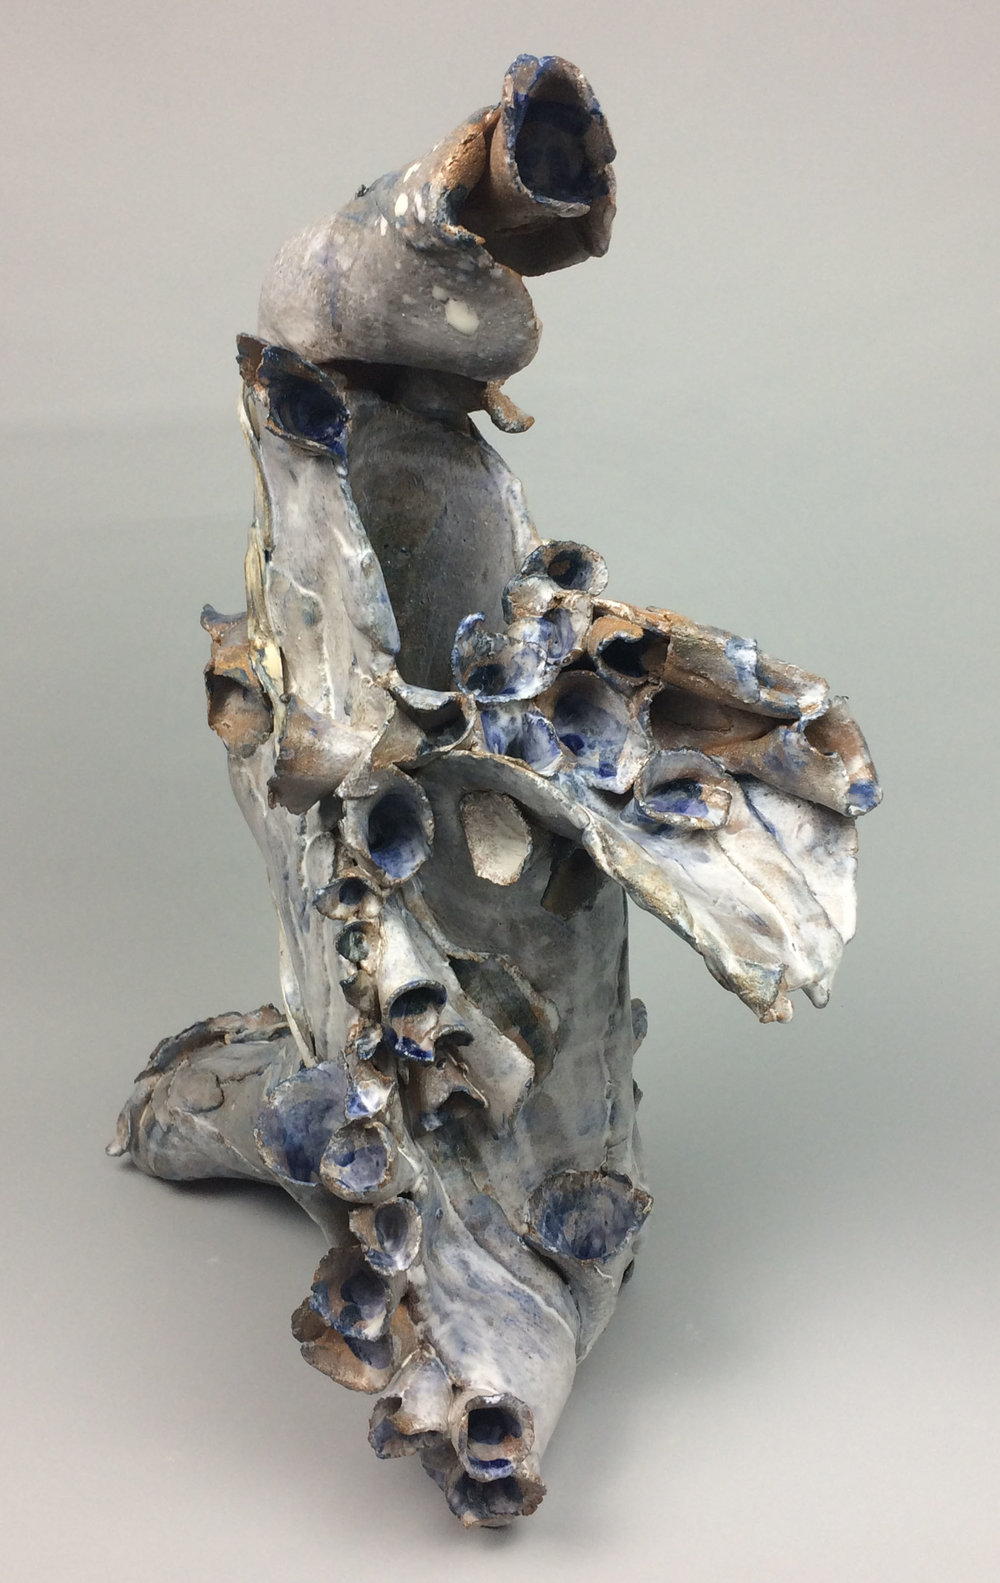 Sara Fine-Wilson,  Bent,  Stoneware, 20x16x18